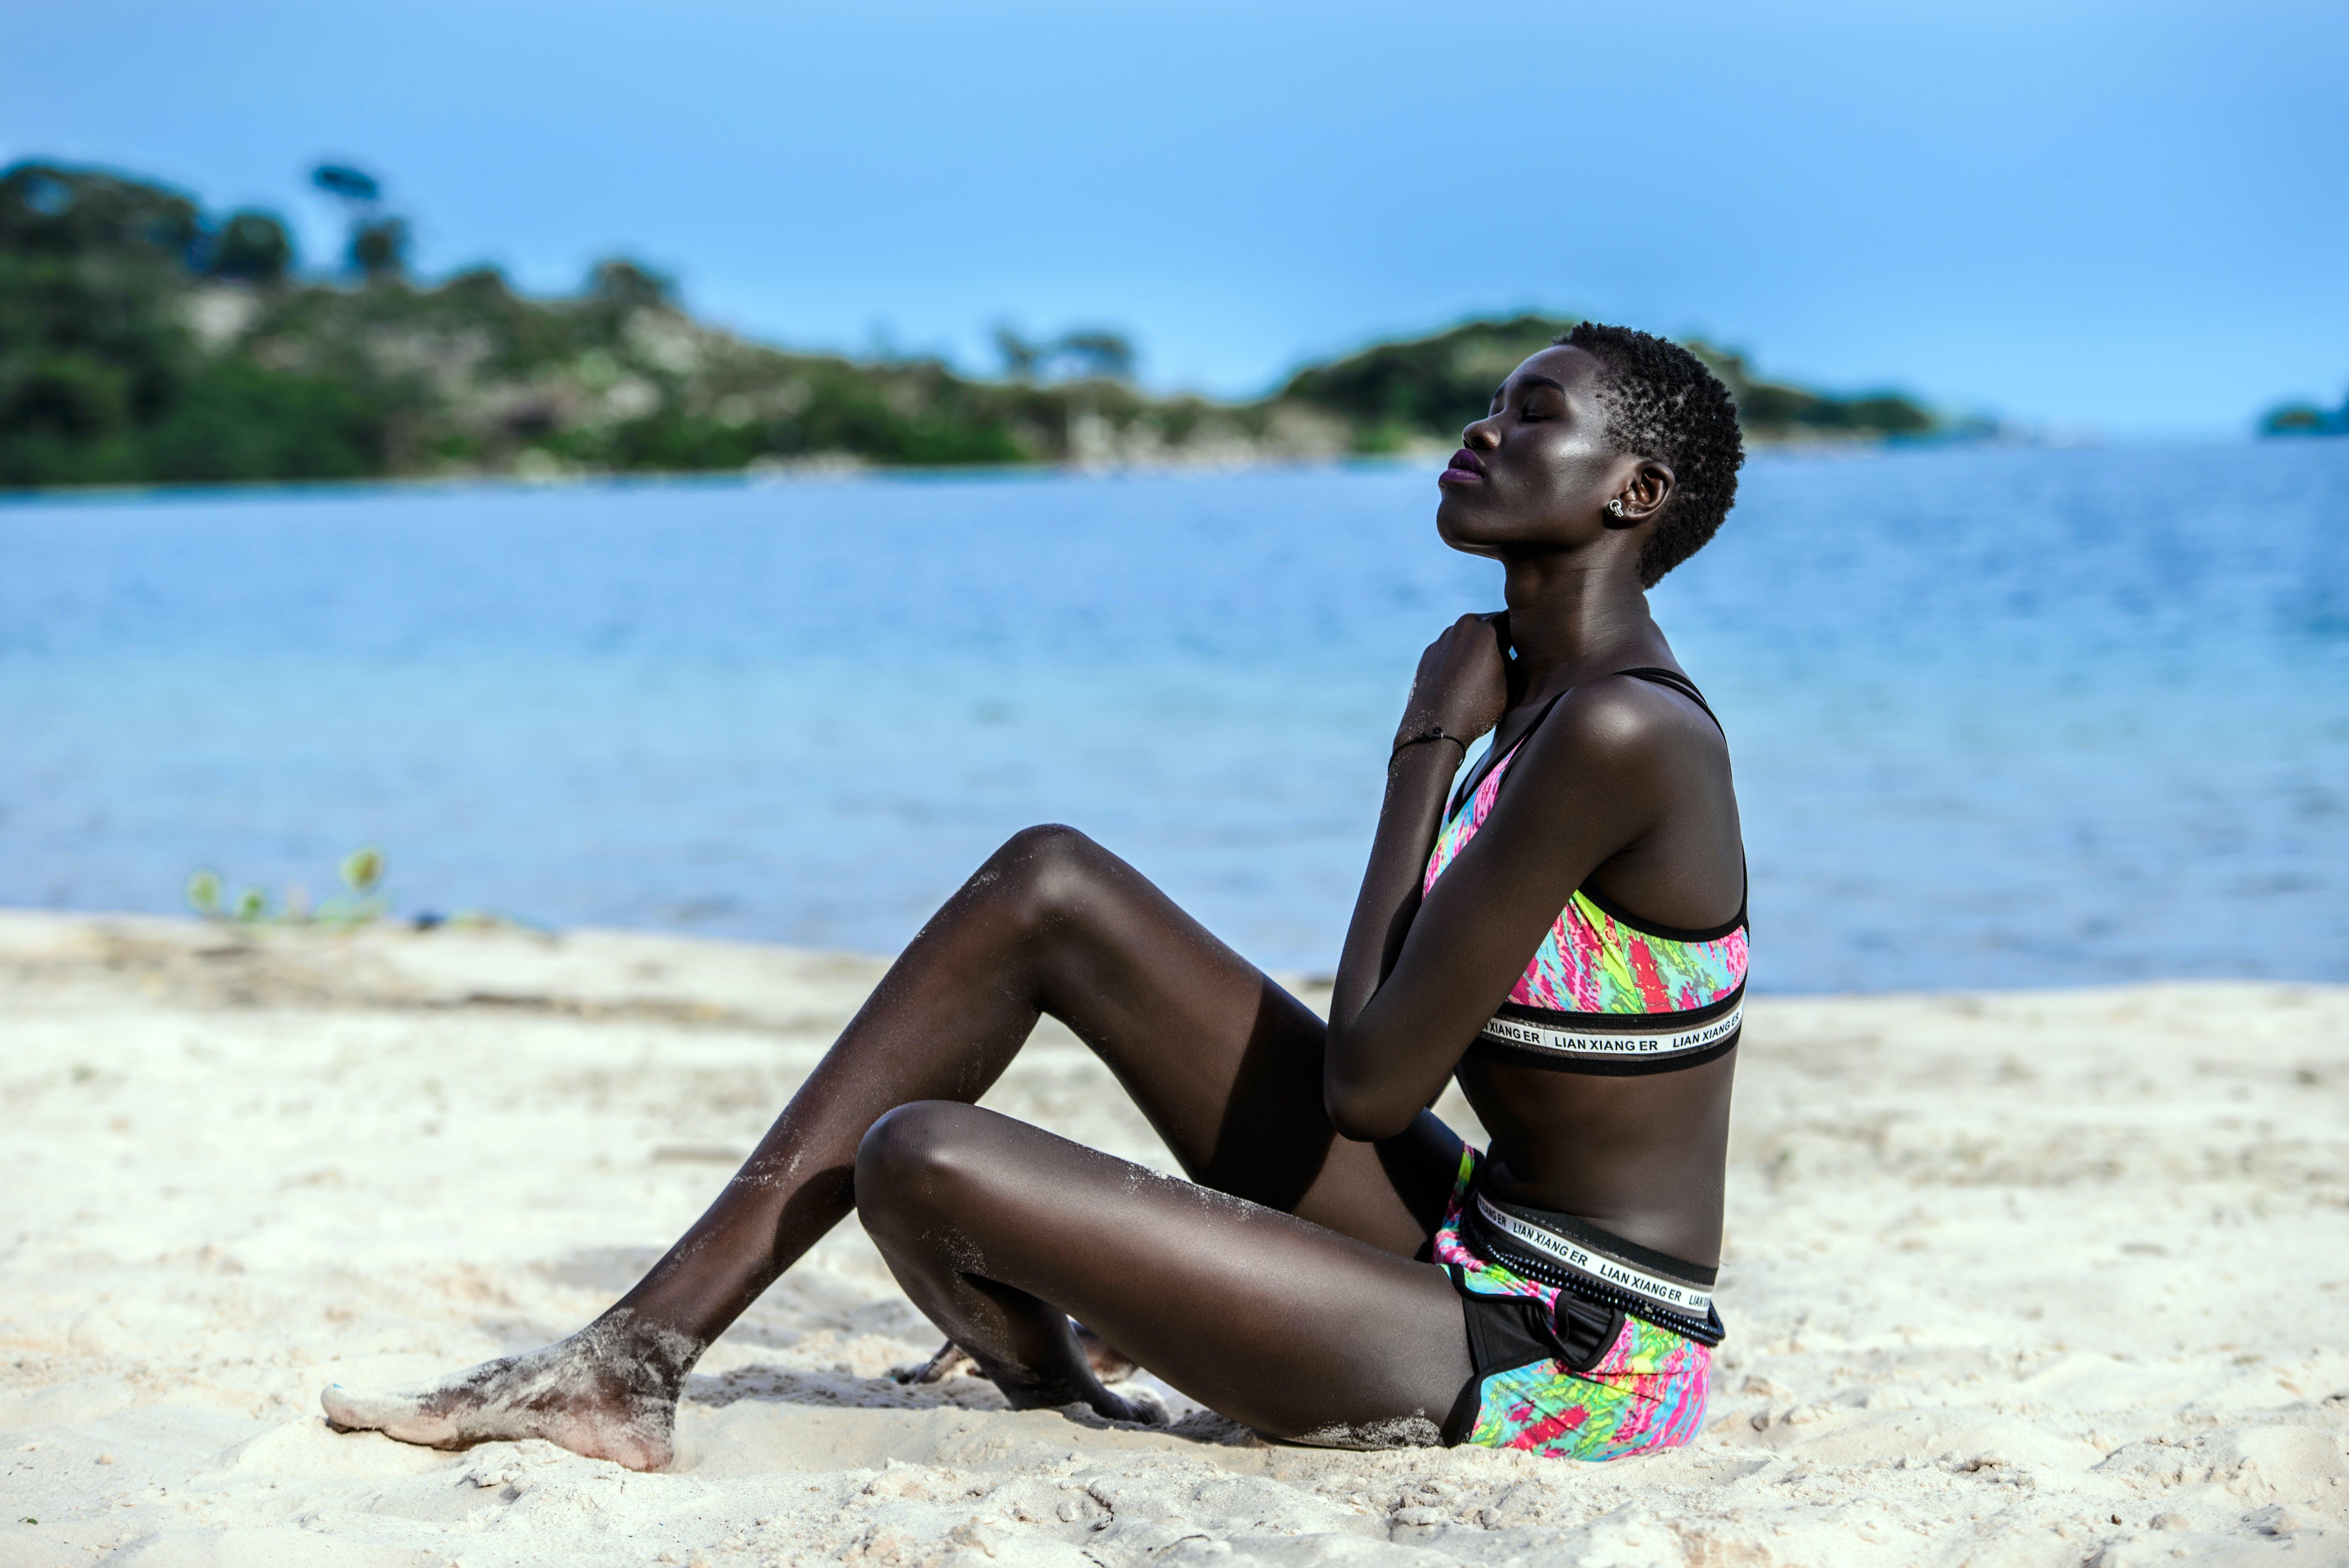 Woman Sitting on Beach Sands